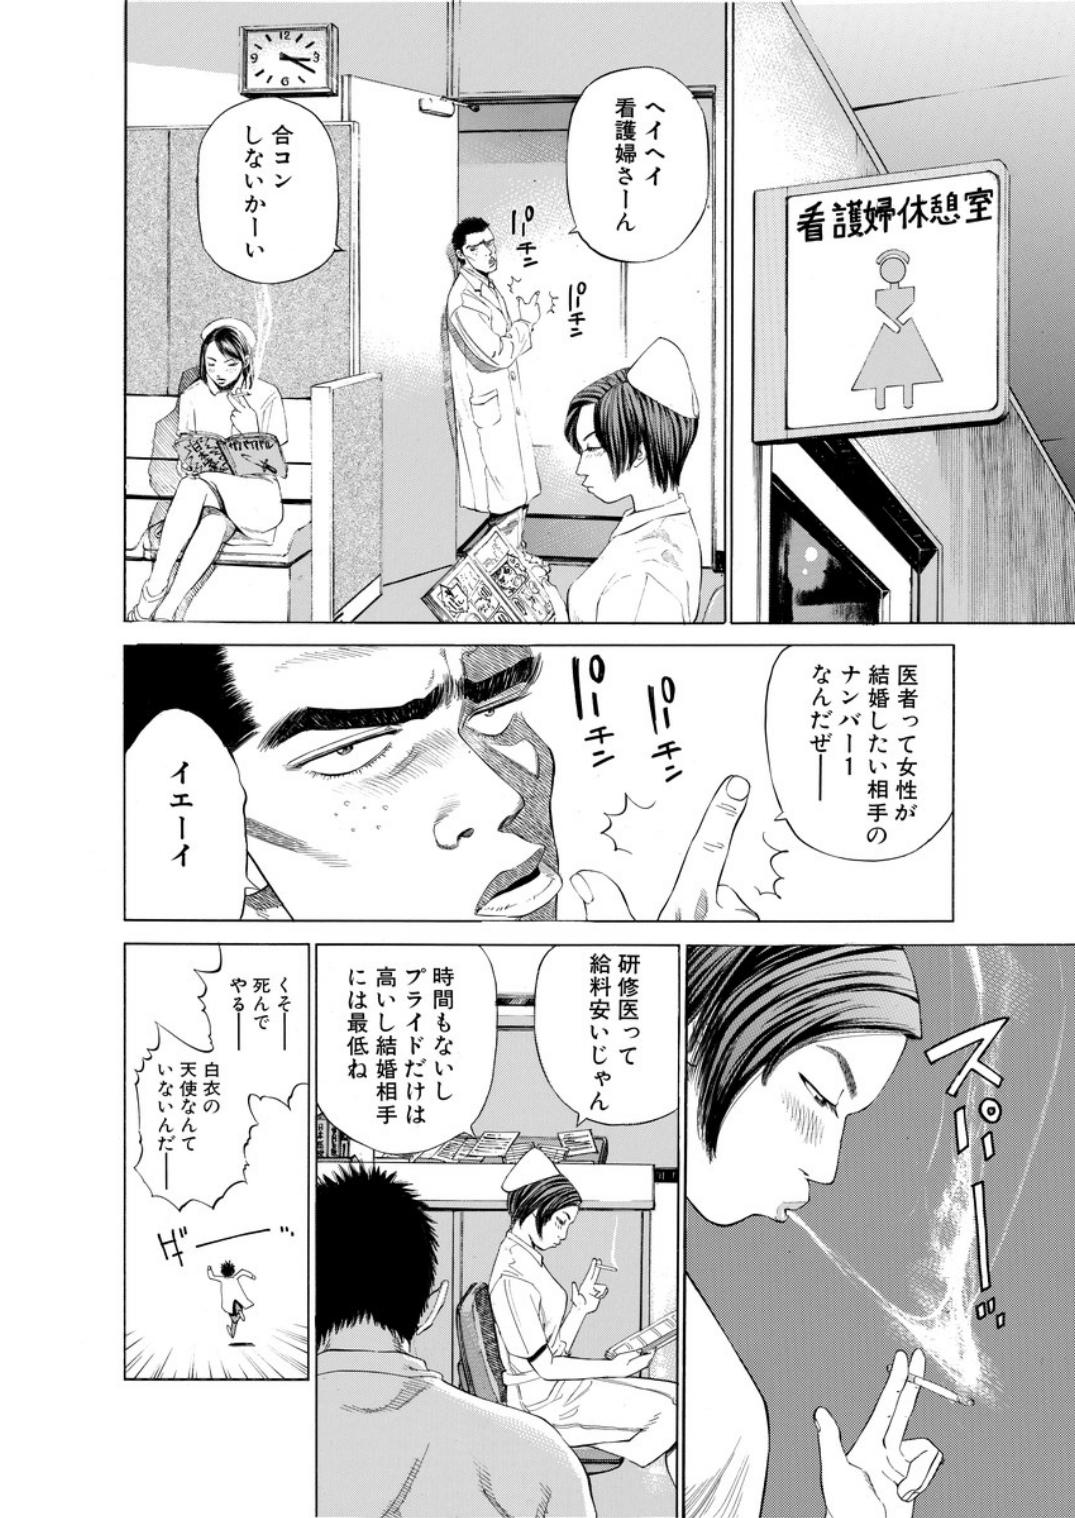 001bj_page-0156.jpg